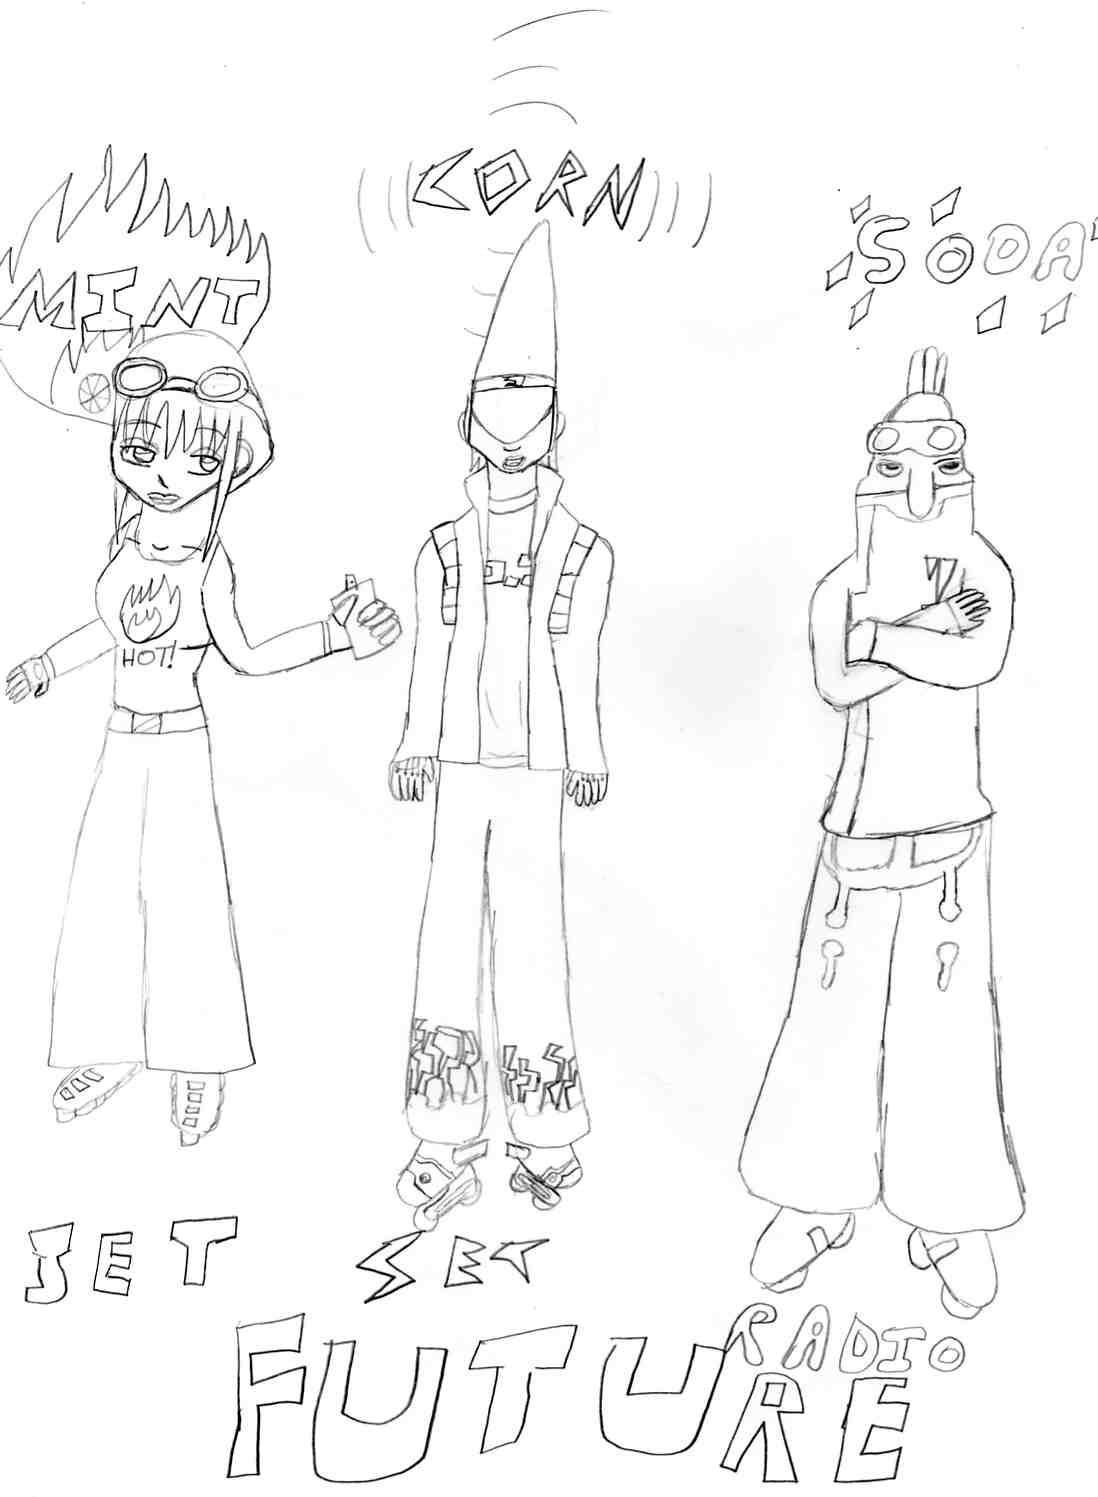 JSRF: Pencil sketch by Weird_gurl